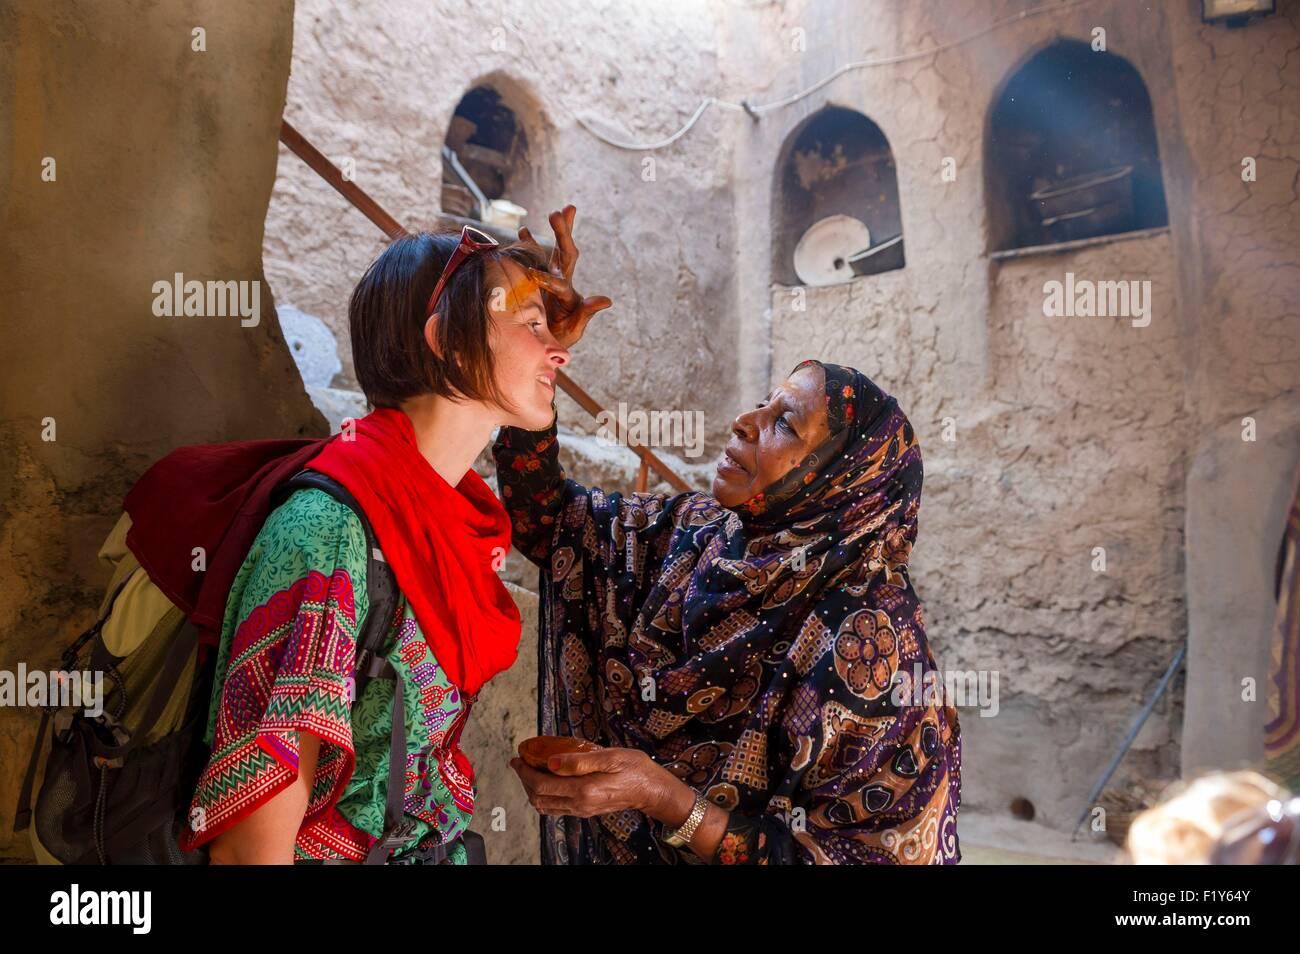 Oman, Djebel Akhdar, Al Hamra old village, ecomuseum of Bait al Safah, make up - Stock Image